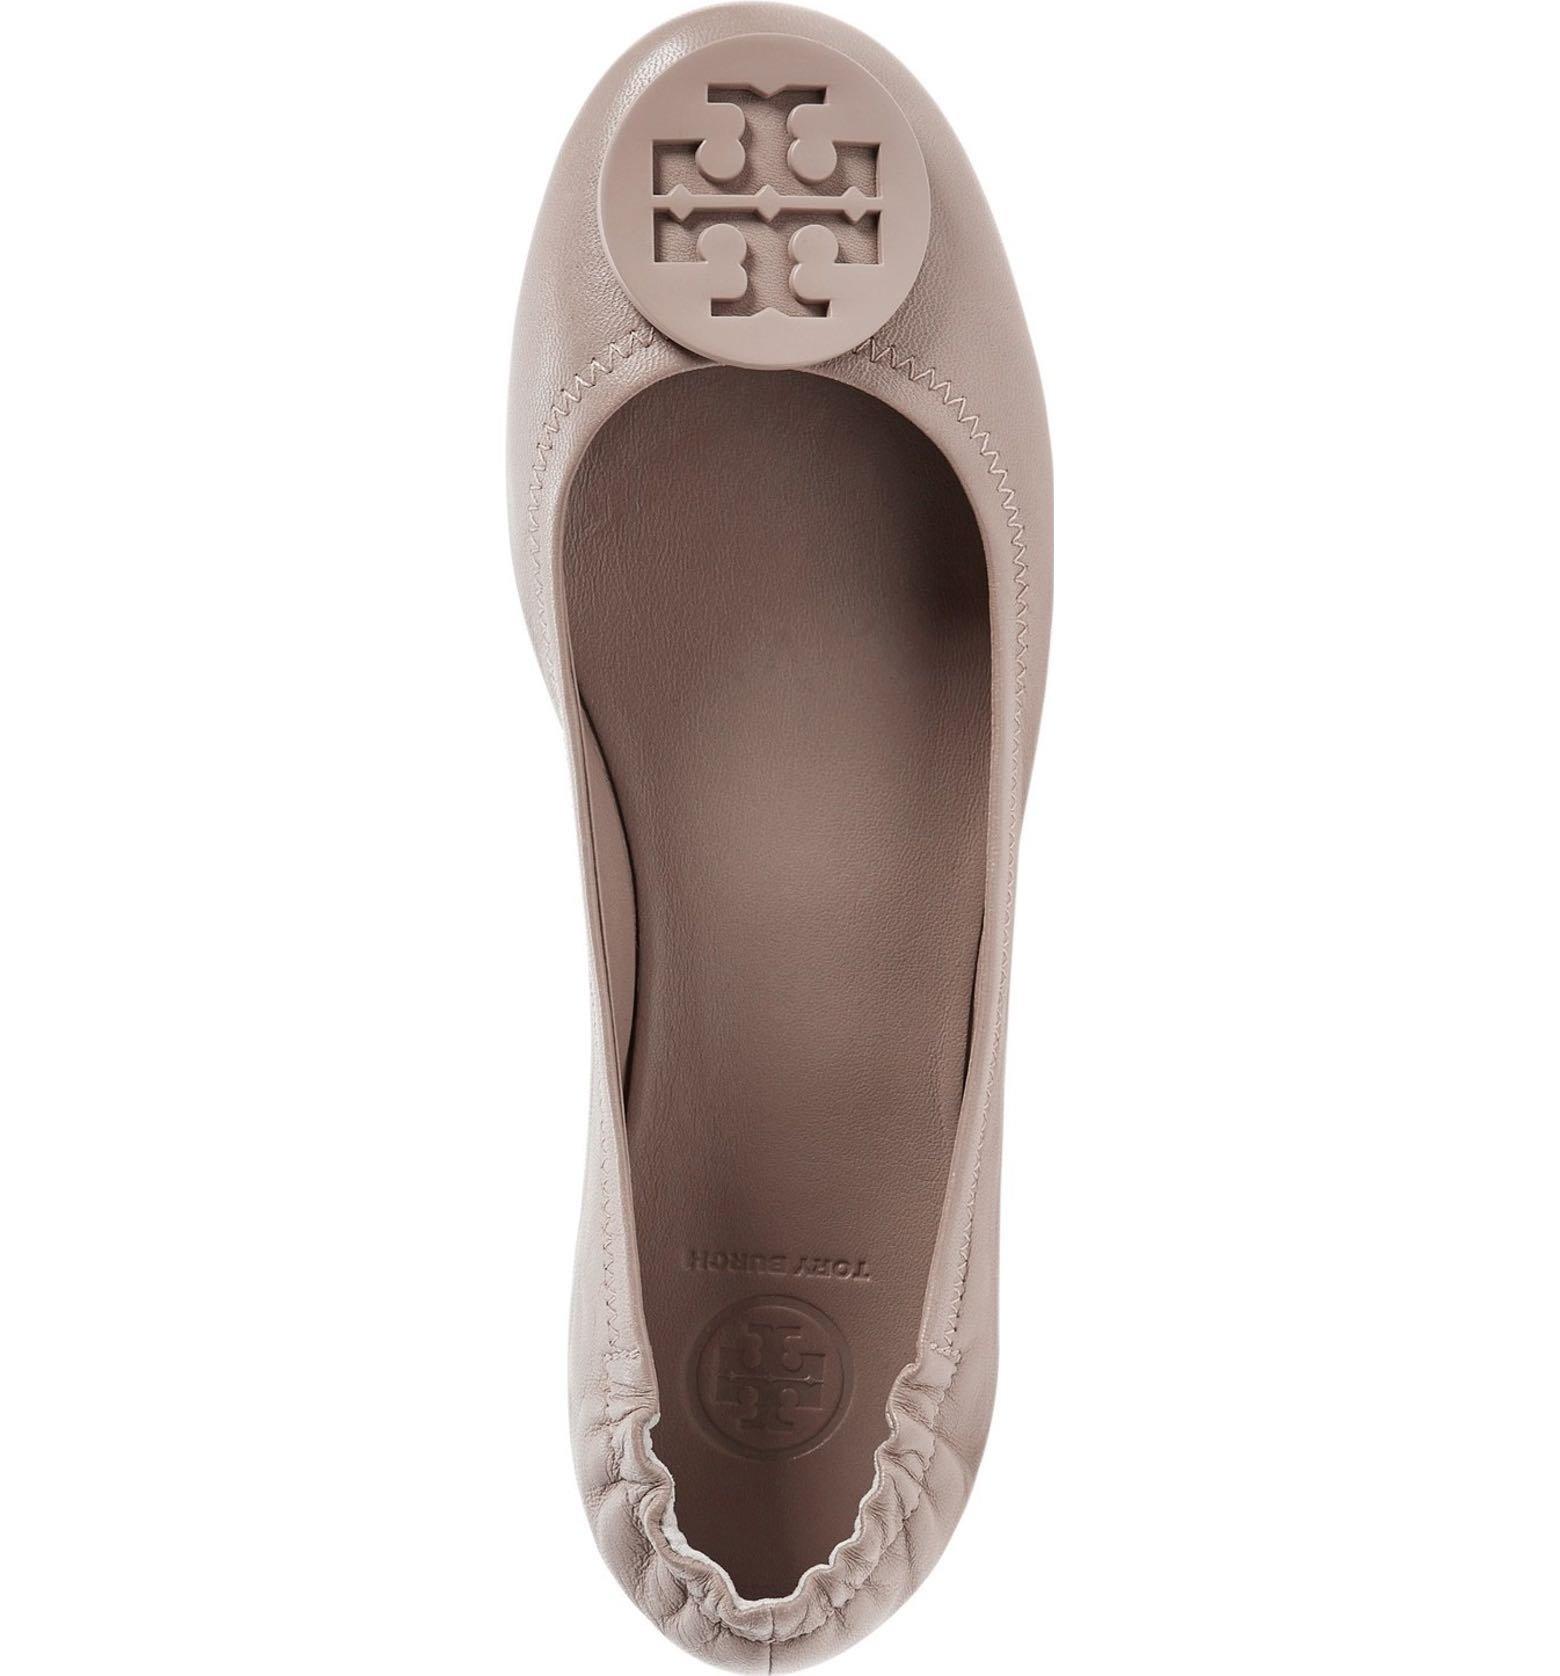 Tory Burch Minnie Travel Ballet Flat, French Gray (7)